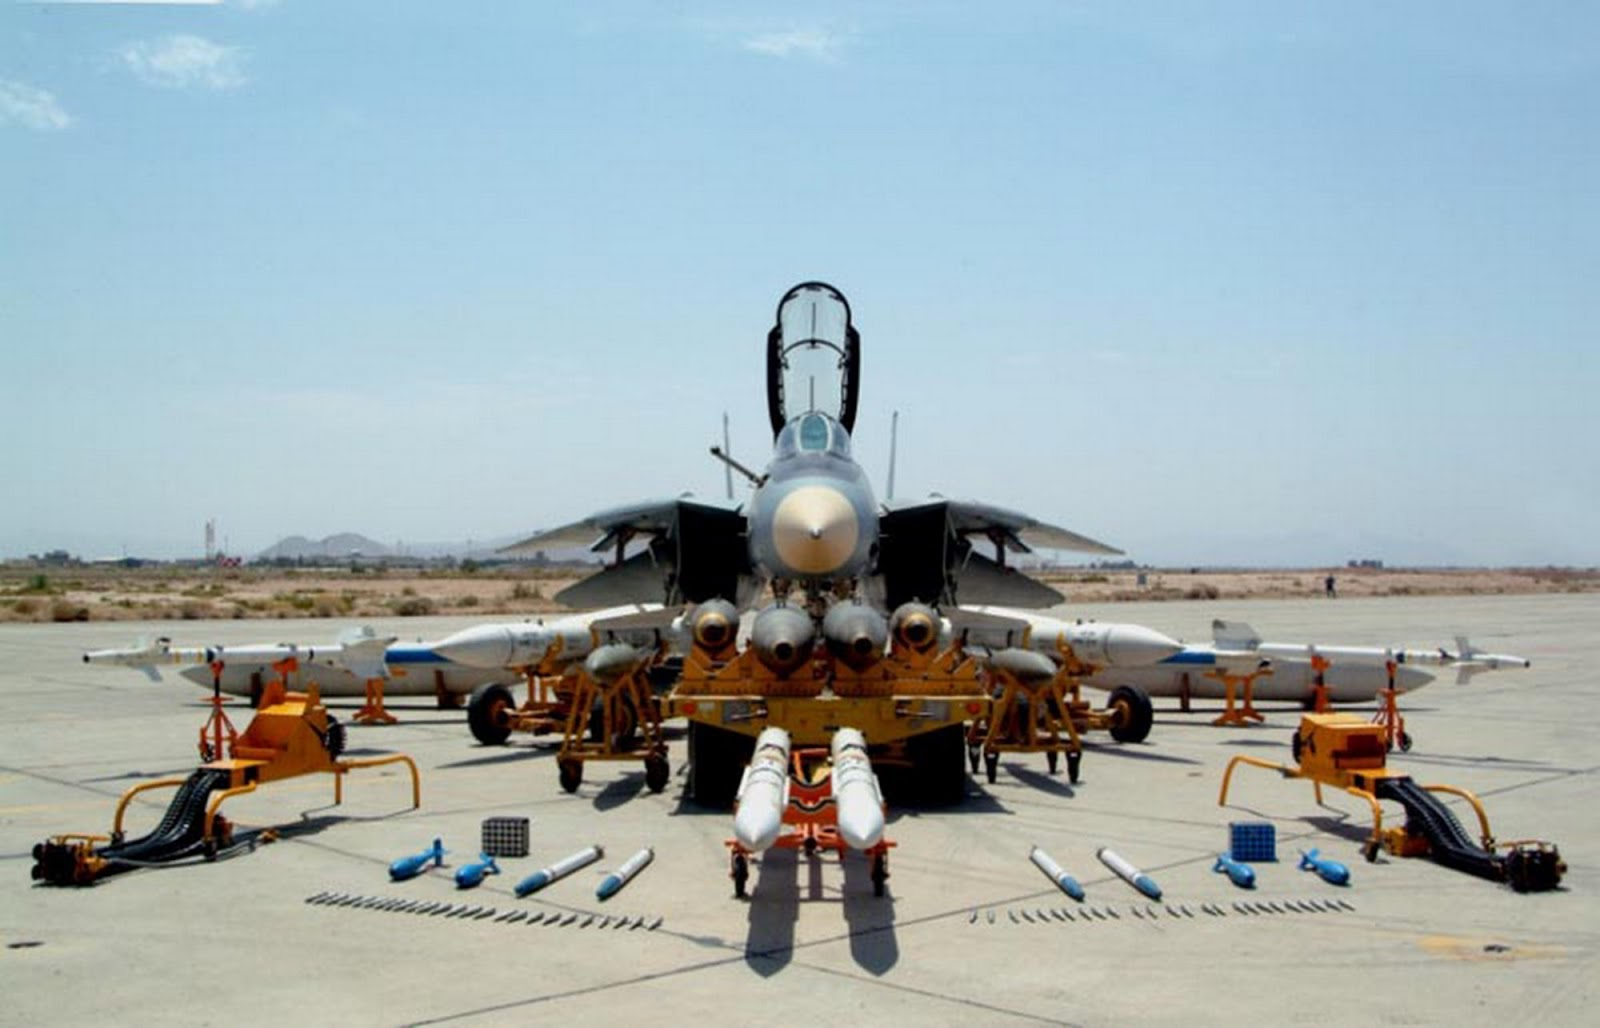 https://i2.wp.com/4.bp.blogspot.com/-mga3AQJK4UI/UJsY5-QO_NI/AAAAAAAATfA/ueKnpmGYeh8/s1600/Islamic+Republic+of+Iran+Air+Force+(IRIAF)+grumman+F-14+Tomcat+supersonic,+twin-engine,+two-seat,+variable-sweep+wing+fighter+missile+bvr+long+range154+AIM-54+Phoenixaim-7+9+132+(1).jpg?resize=696%2C447&ssl=1